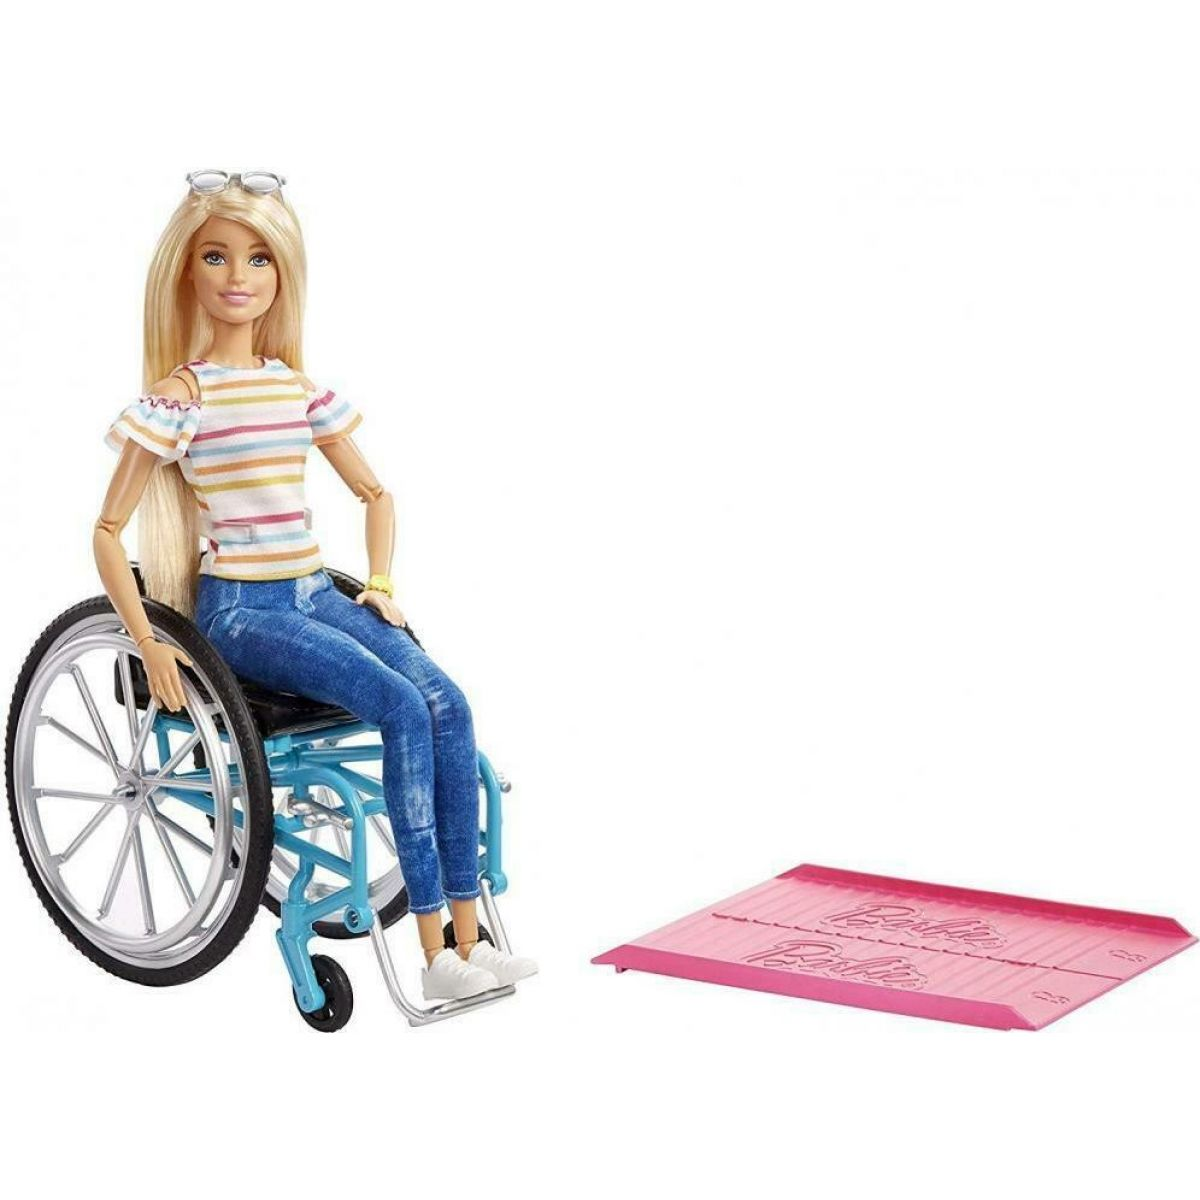 Mattel Barbie panenka na vozíčku